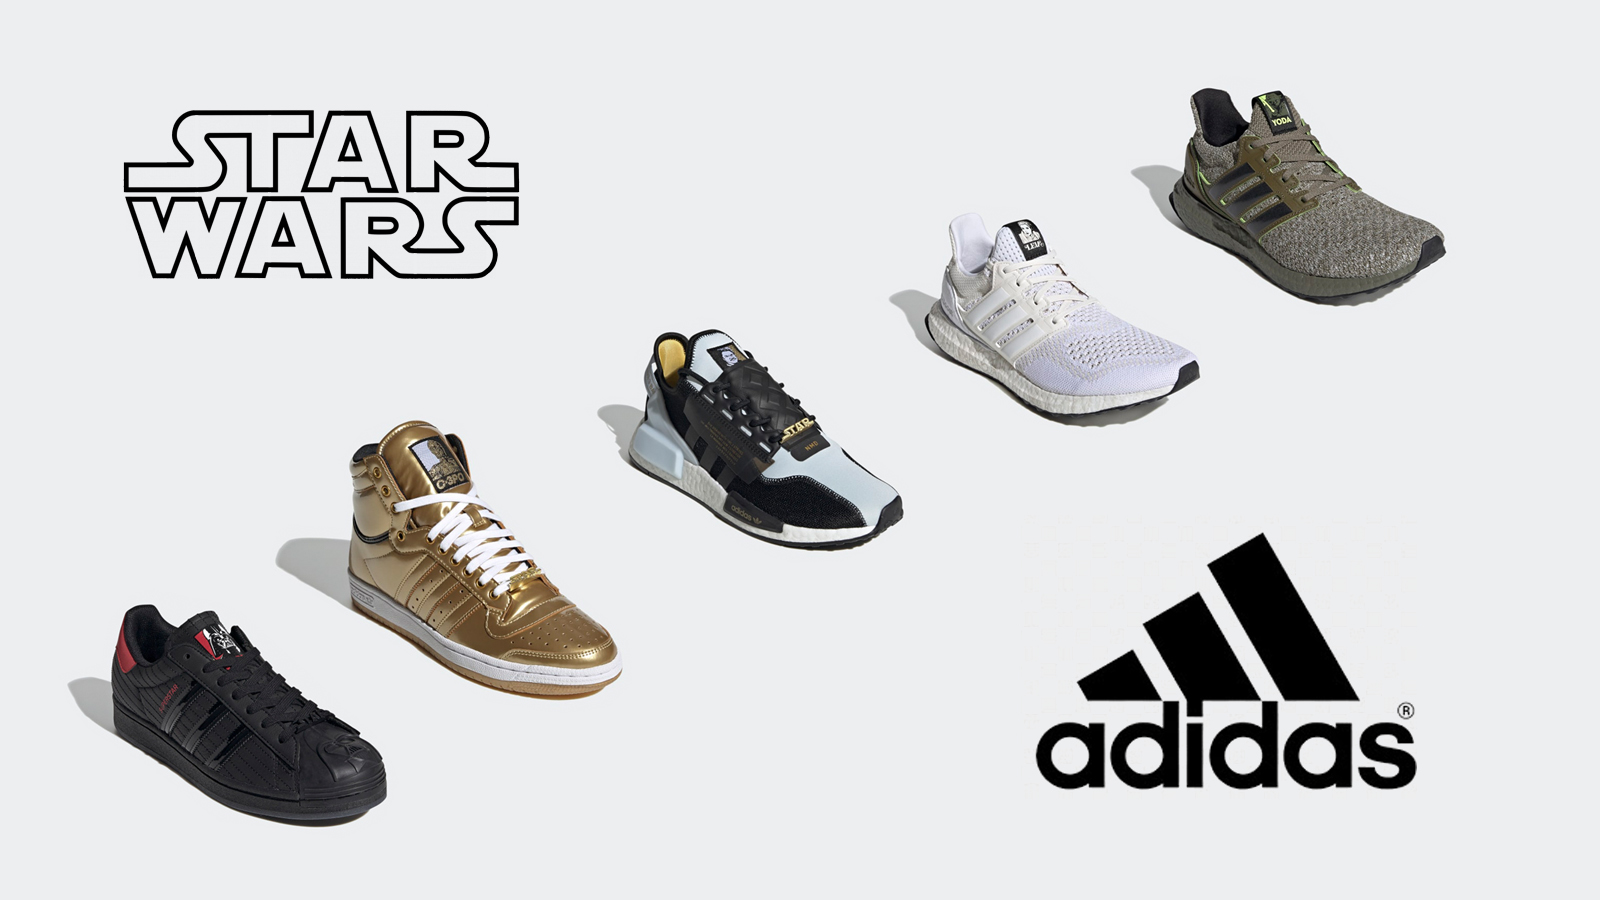 Star Wars x Adidas Collection